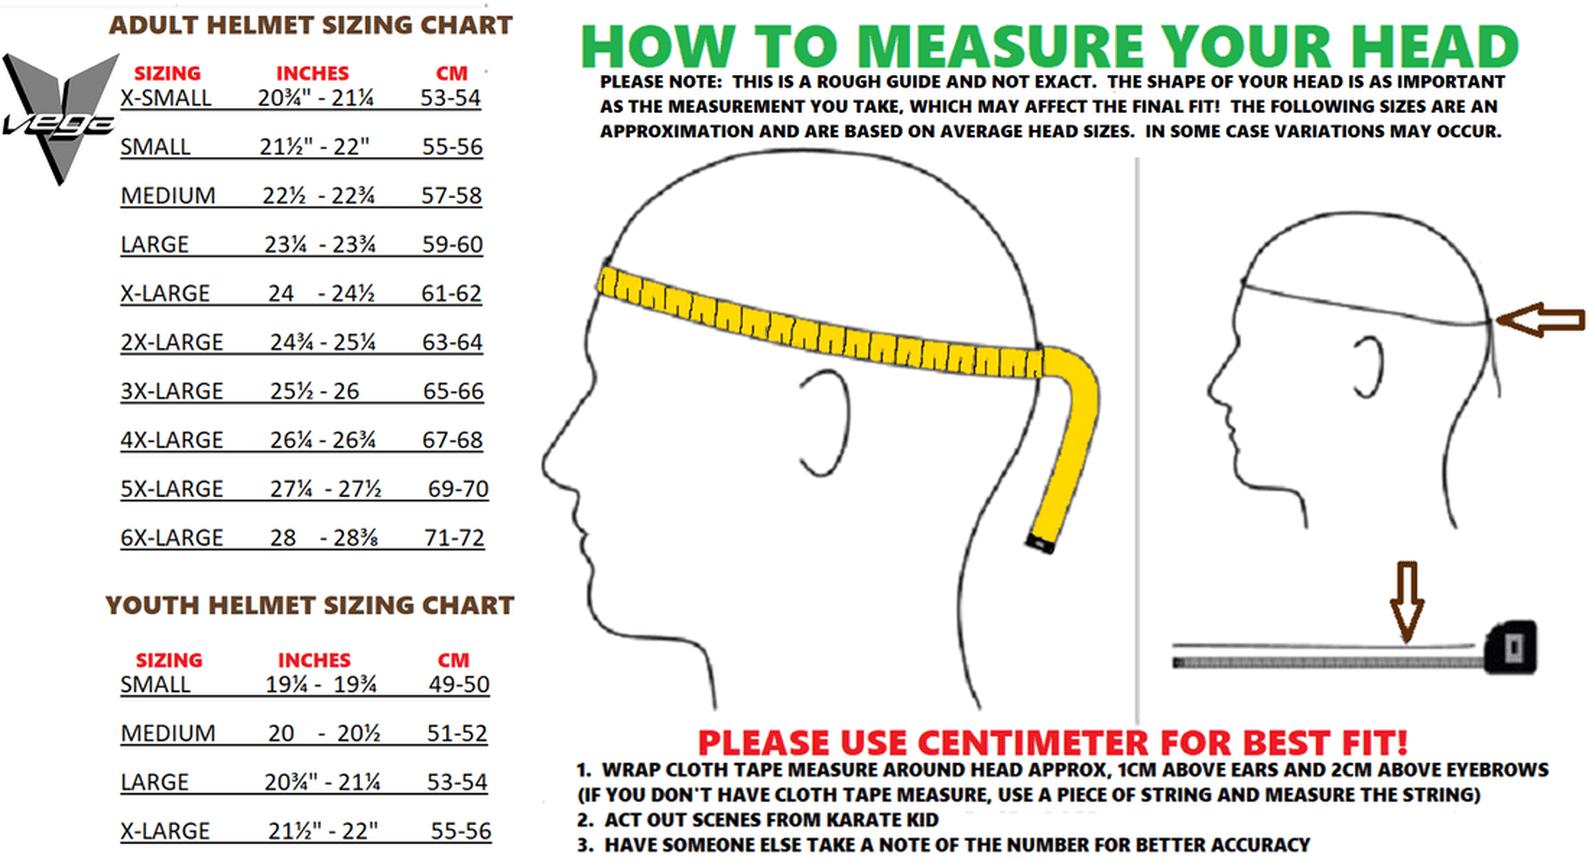 vega-sizing-chart.png